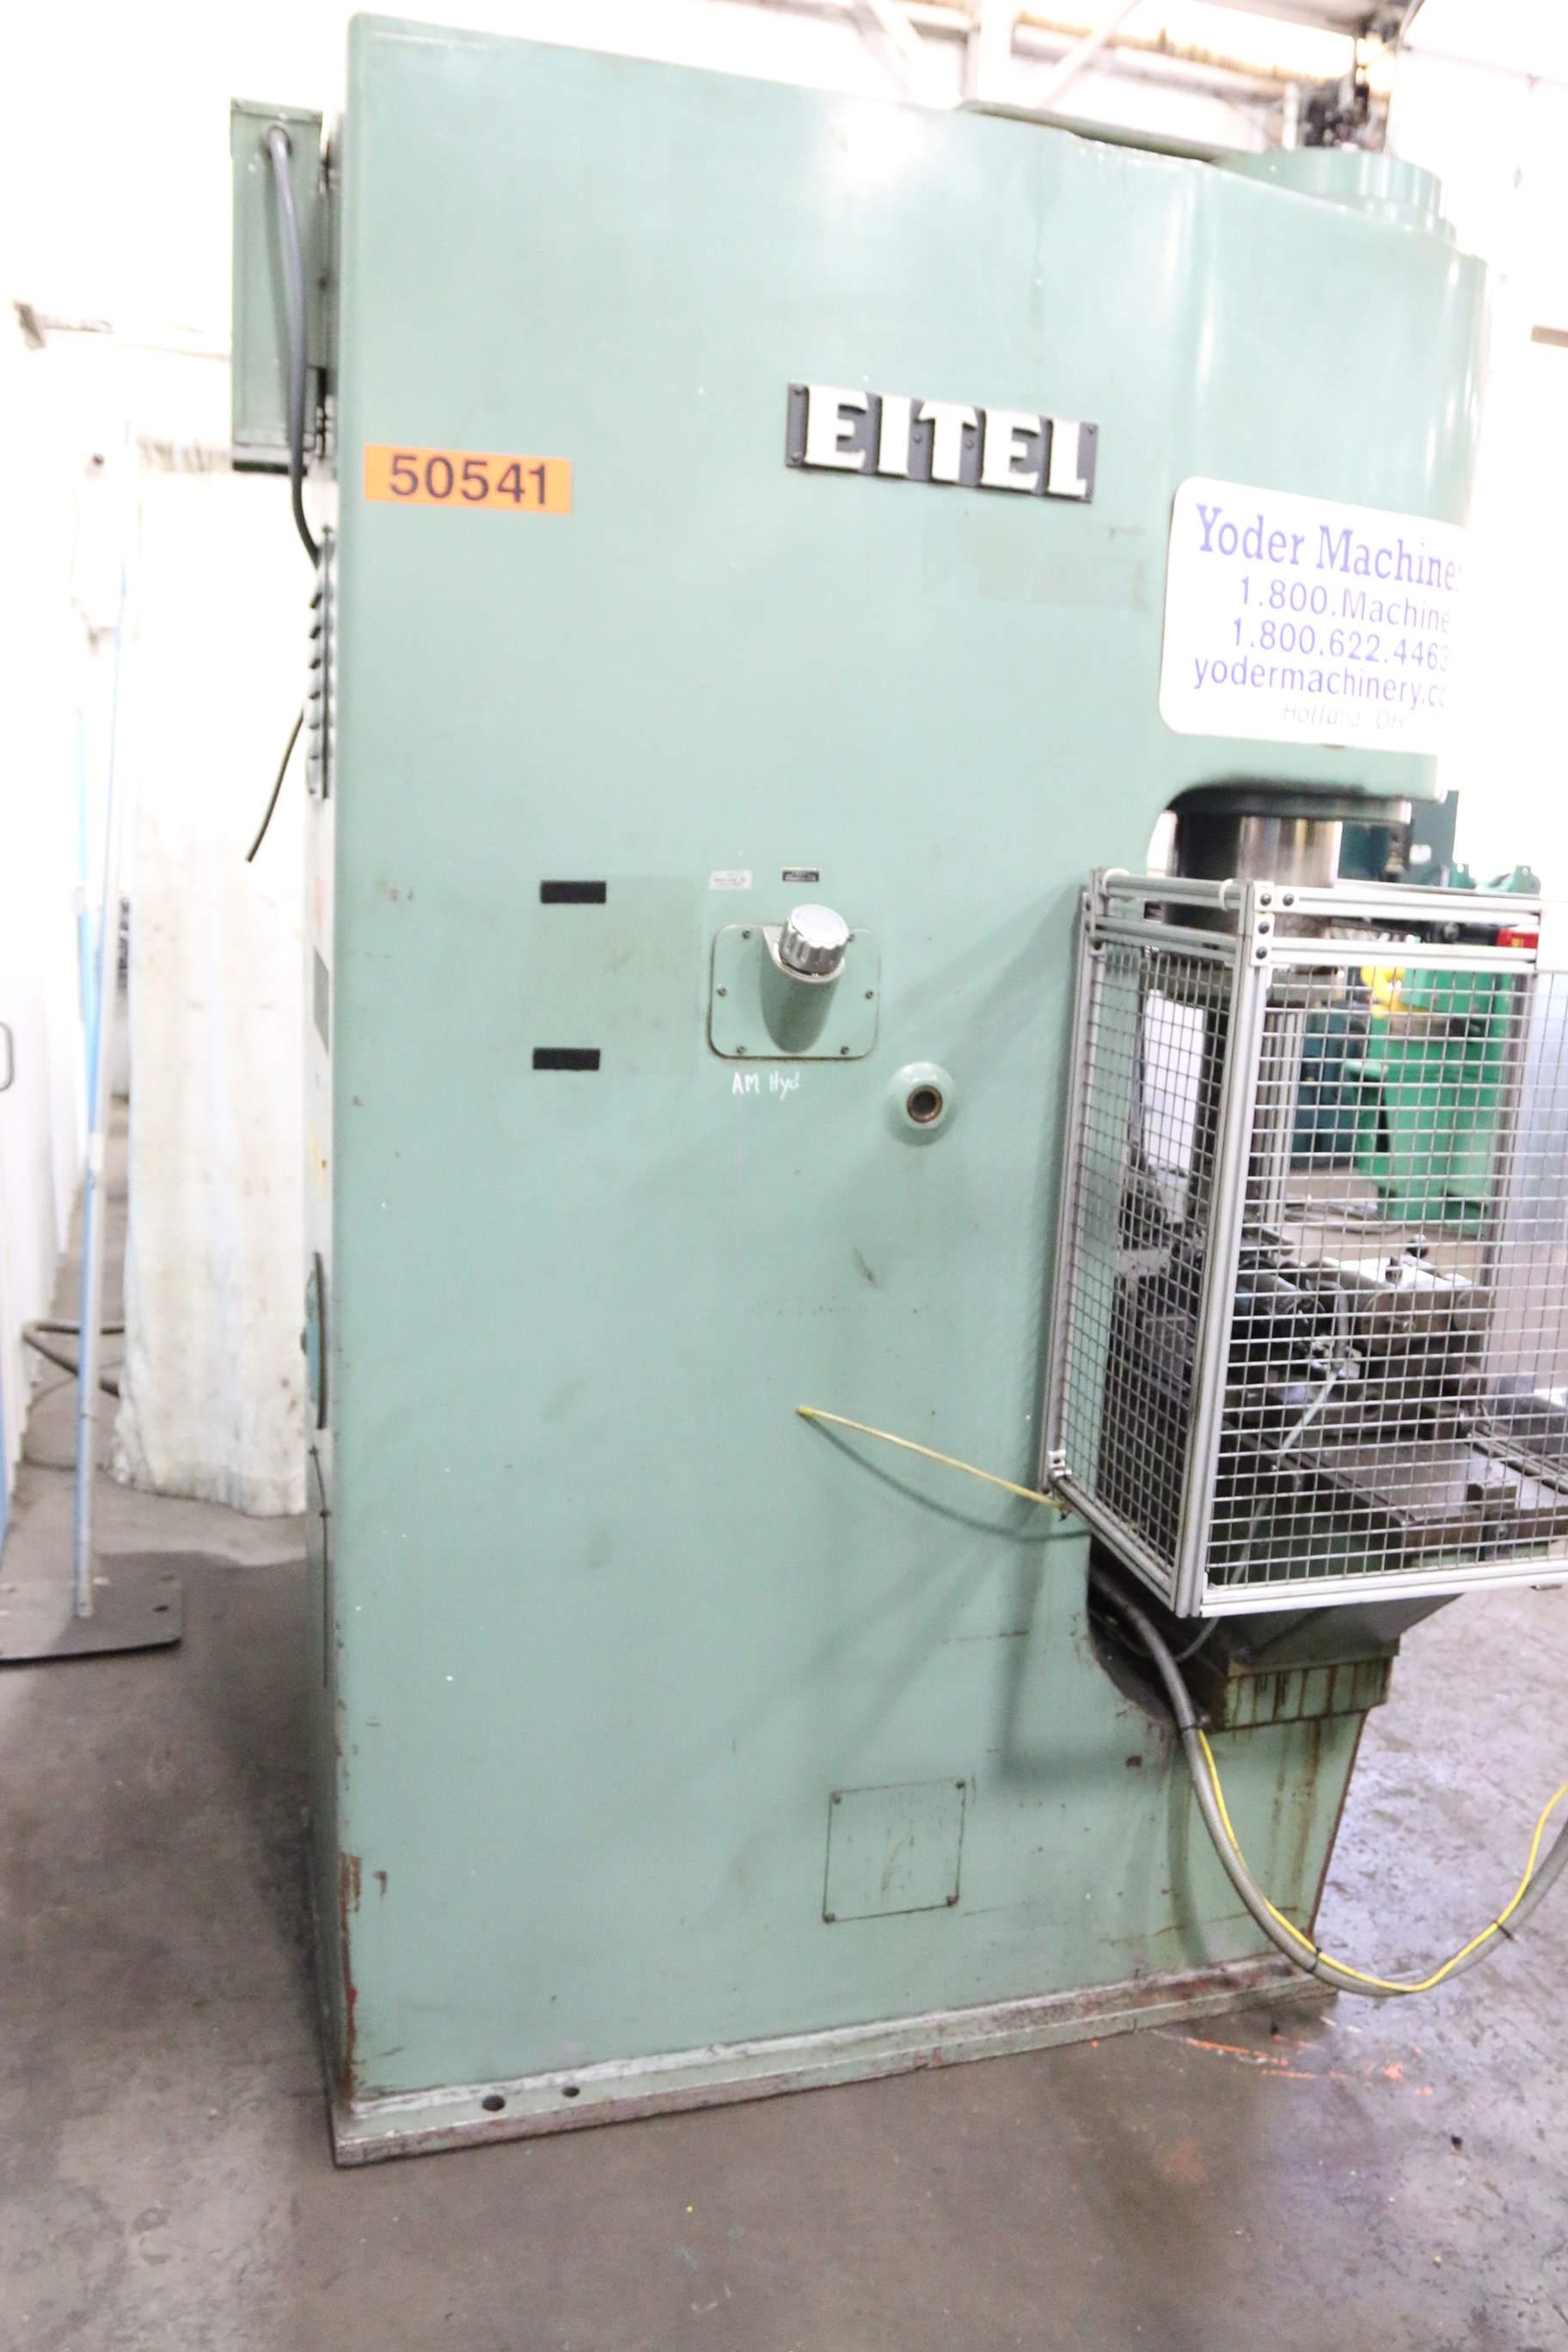 100 Ton Eitel C Frame Straightening Press Stock 68023